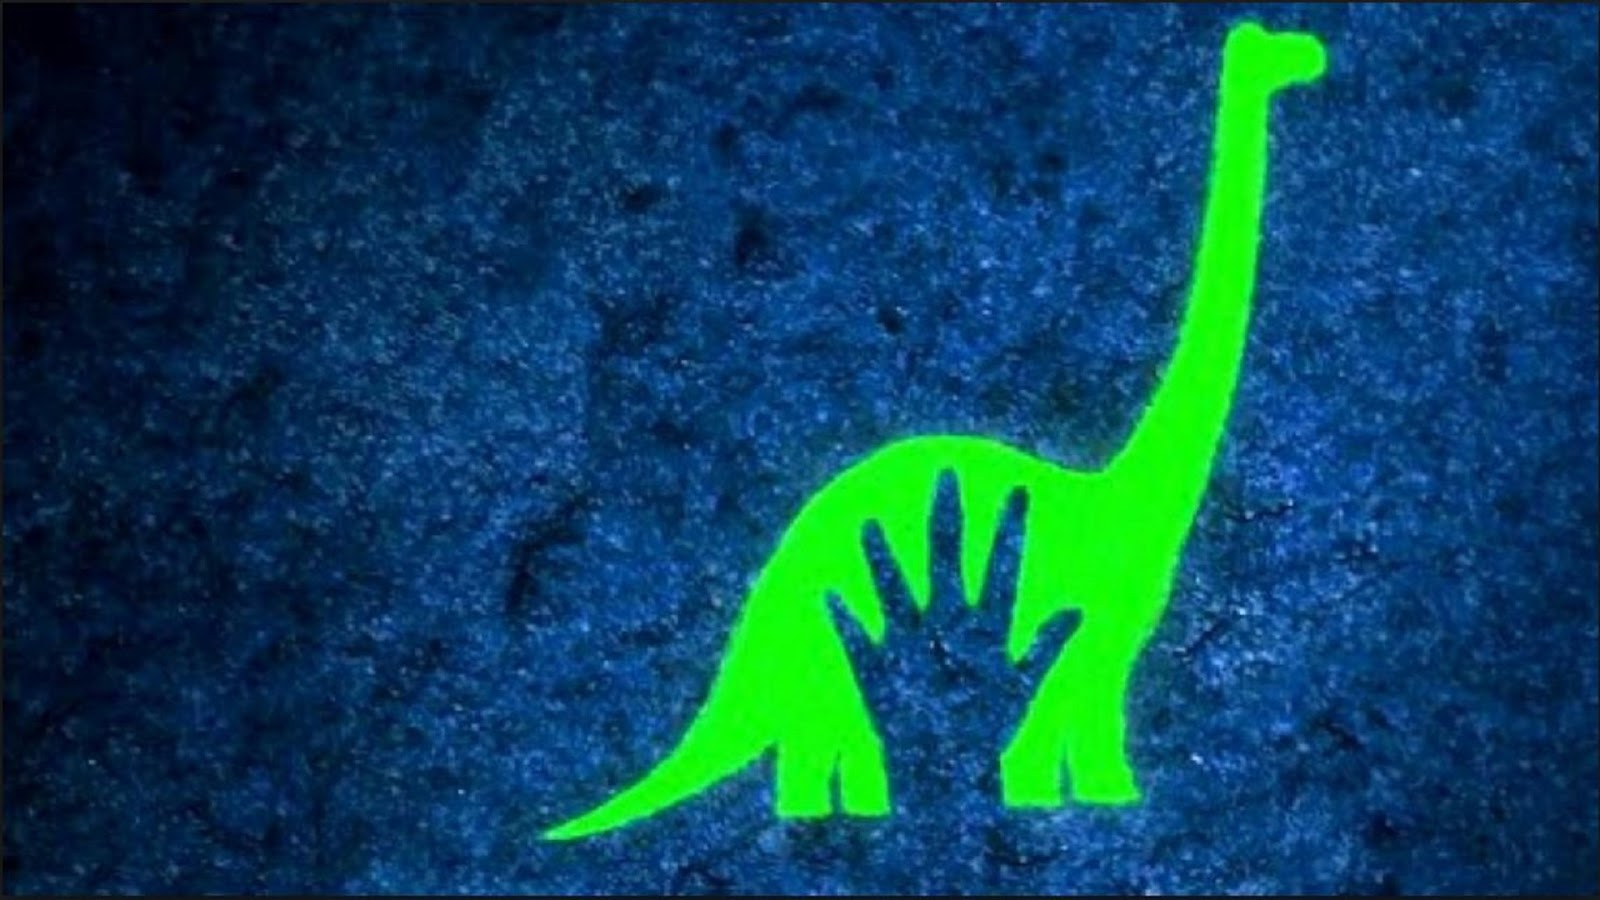 Windows10 Top10 Theme The Good Dinosaur 2015 Windows 10